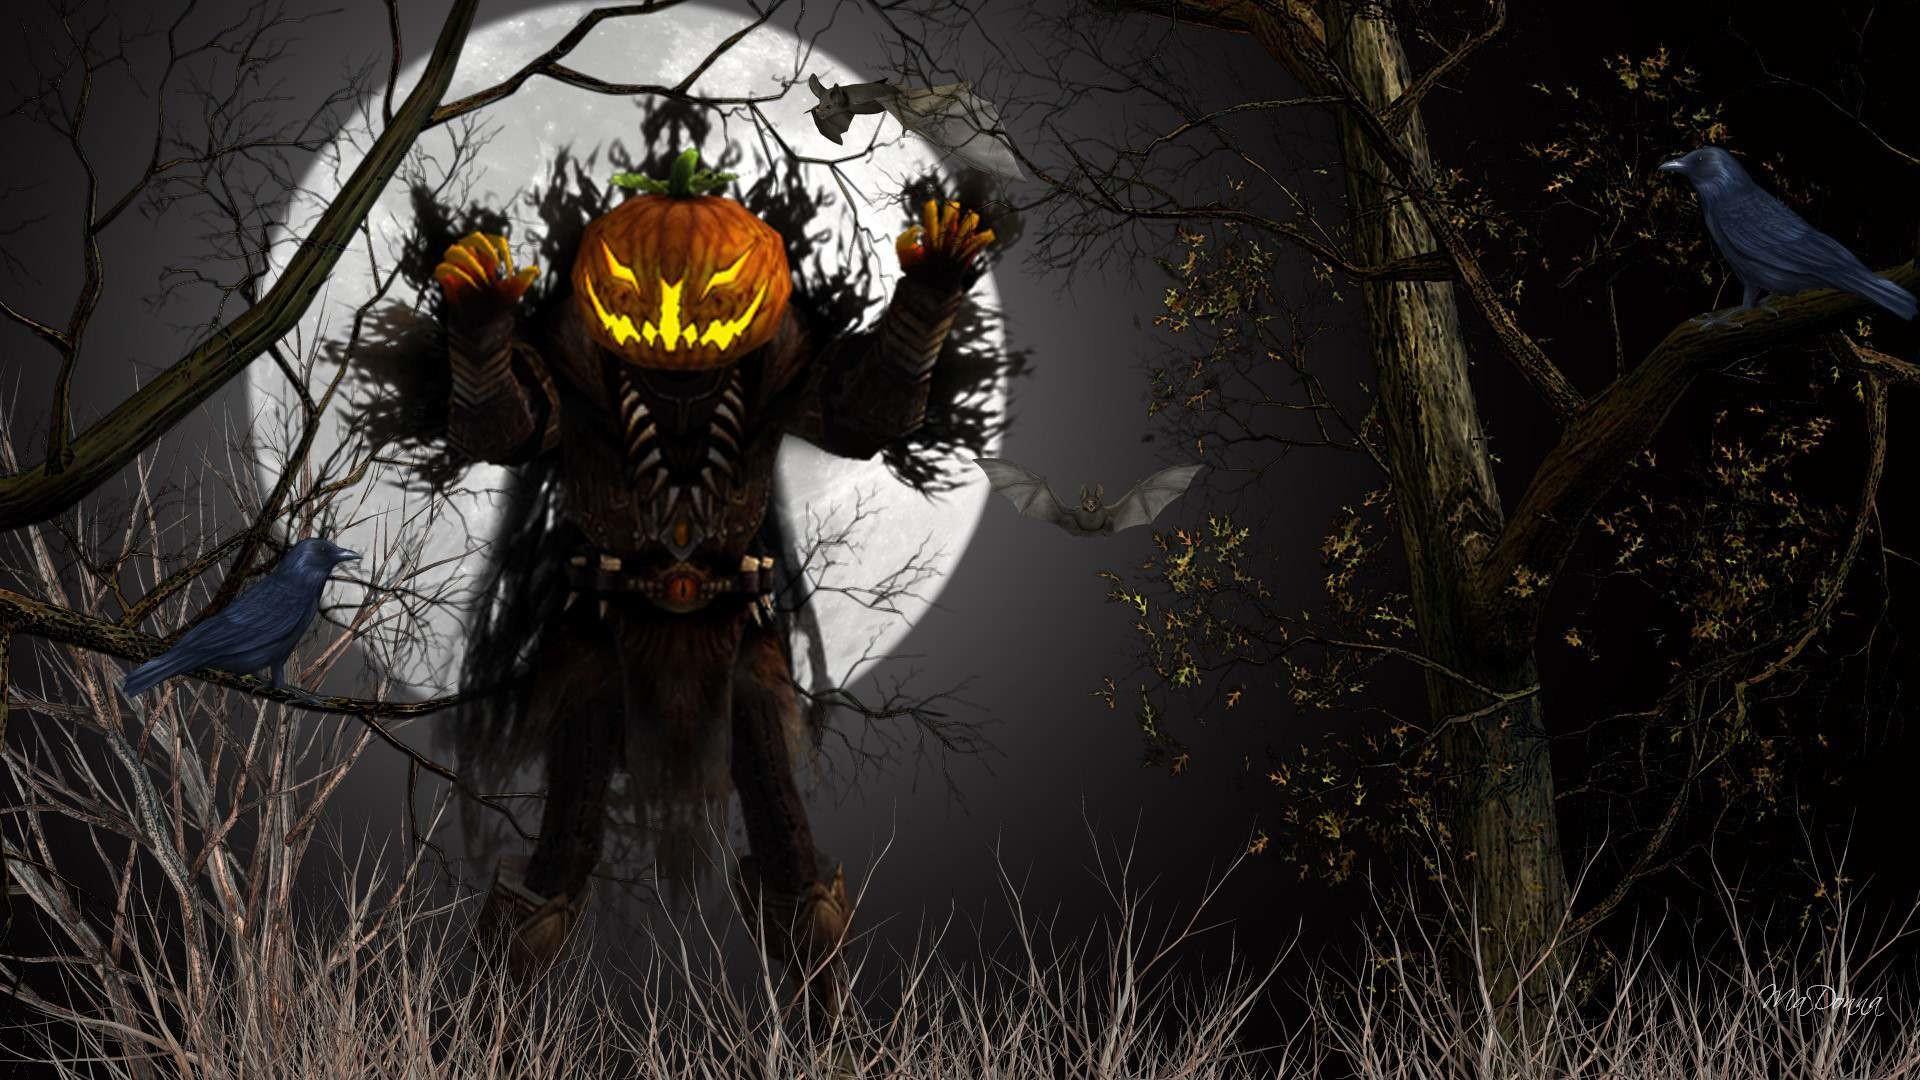 Halloween Wallpaper 1 · Halloween Wallpaper 2 …